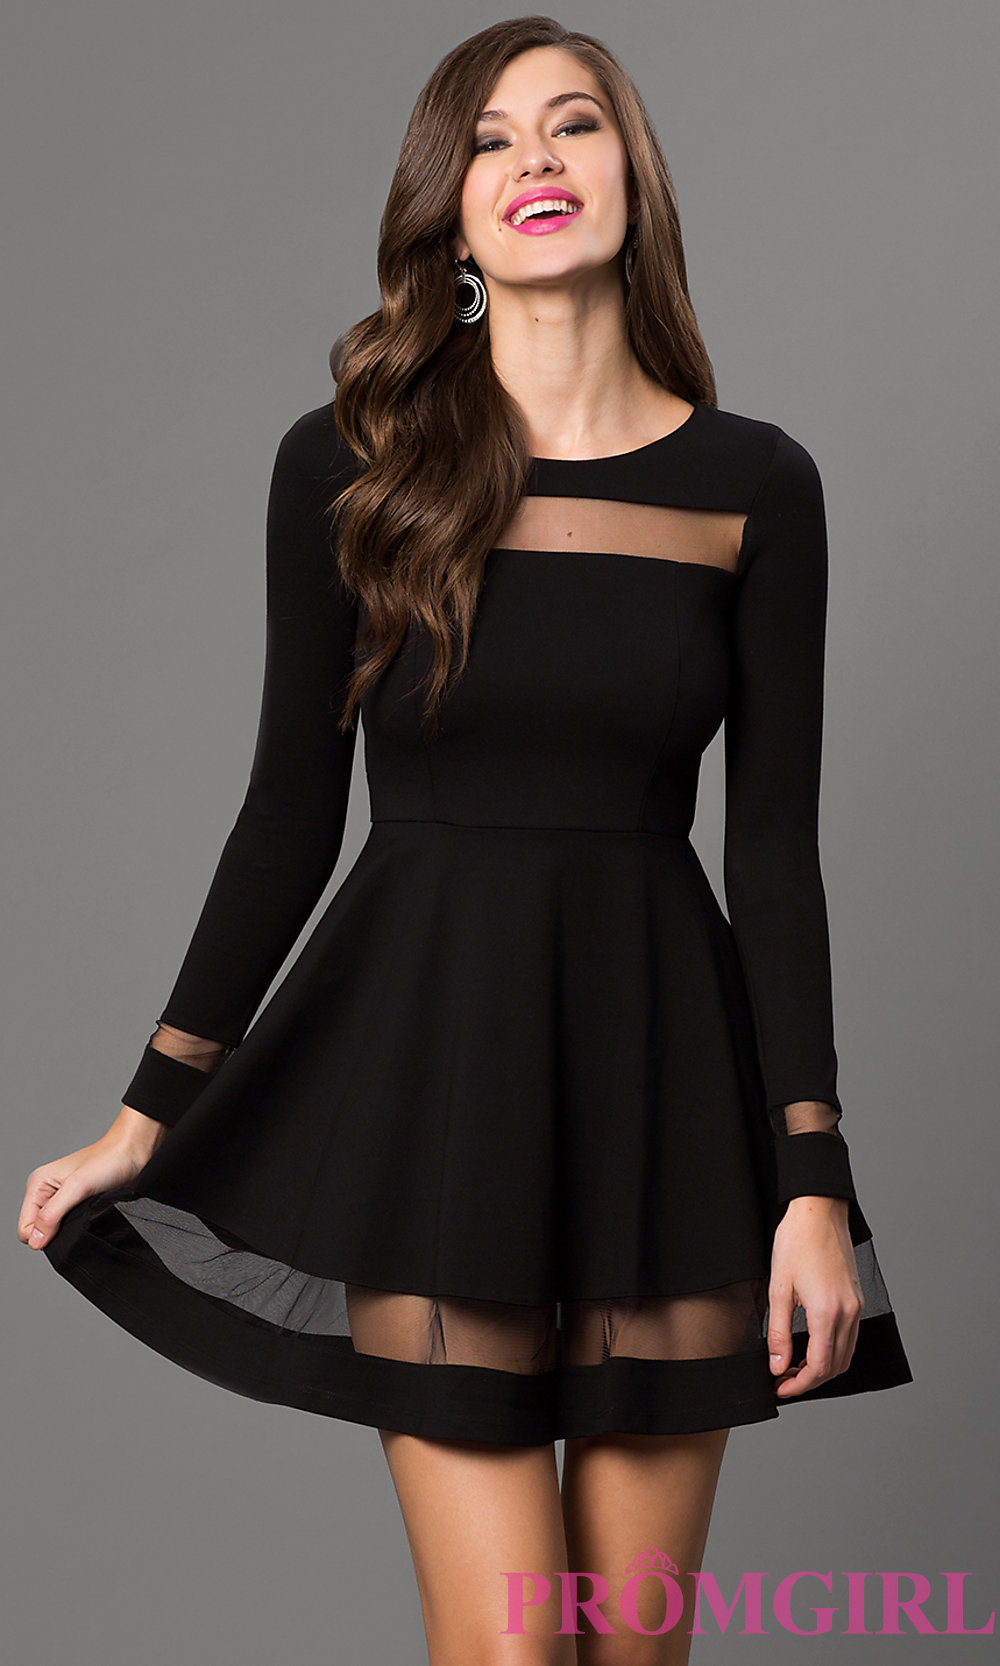 plus size black wedding dresses photo - 1